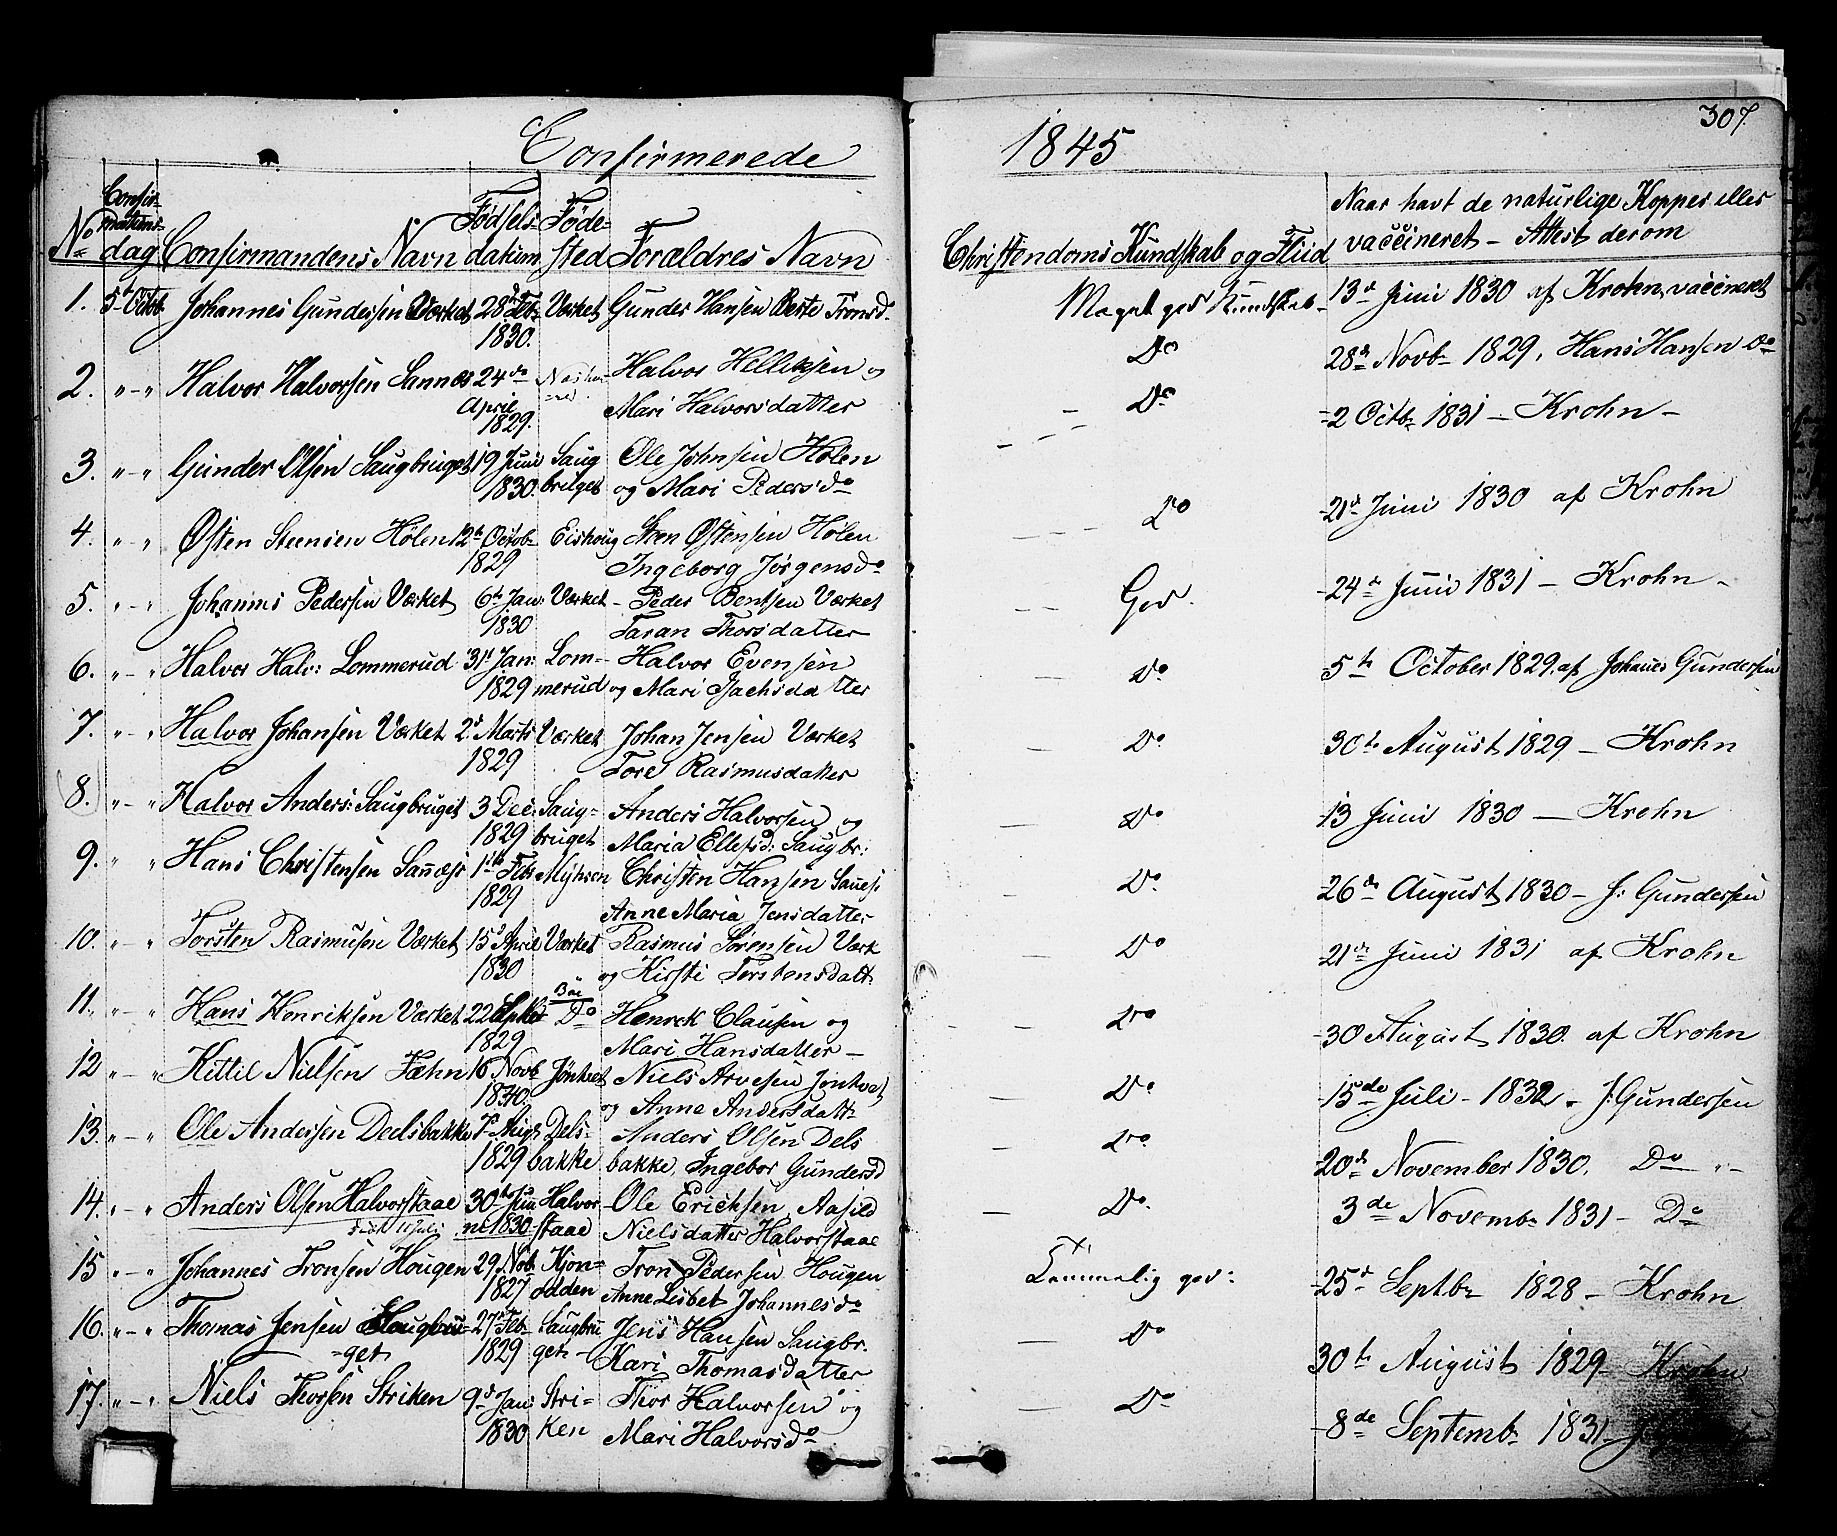 SAKO, Holla kirkebøker, F/Fa/L0004: Ministerialbok nr. 4, 1830-1848, s. 307